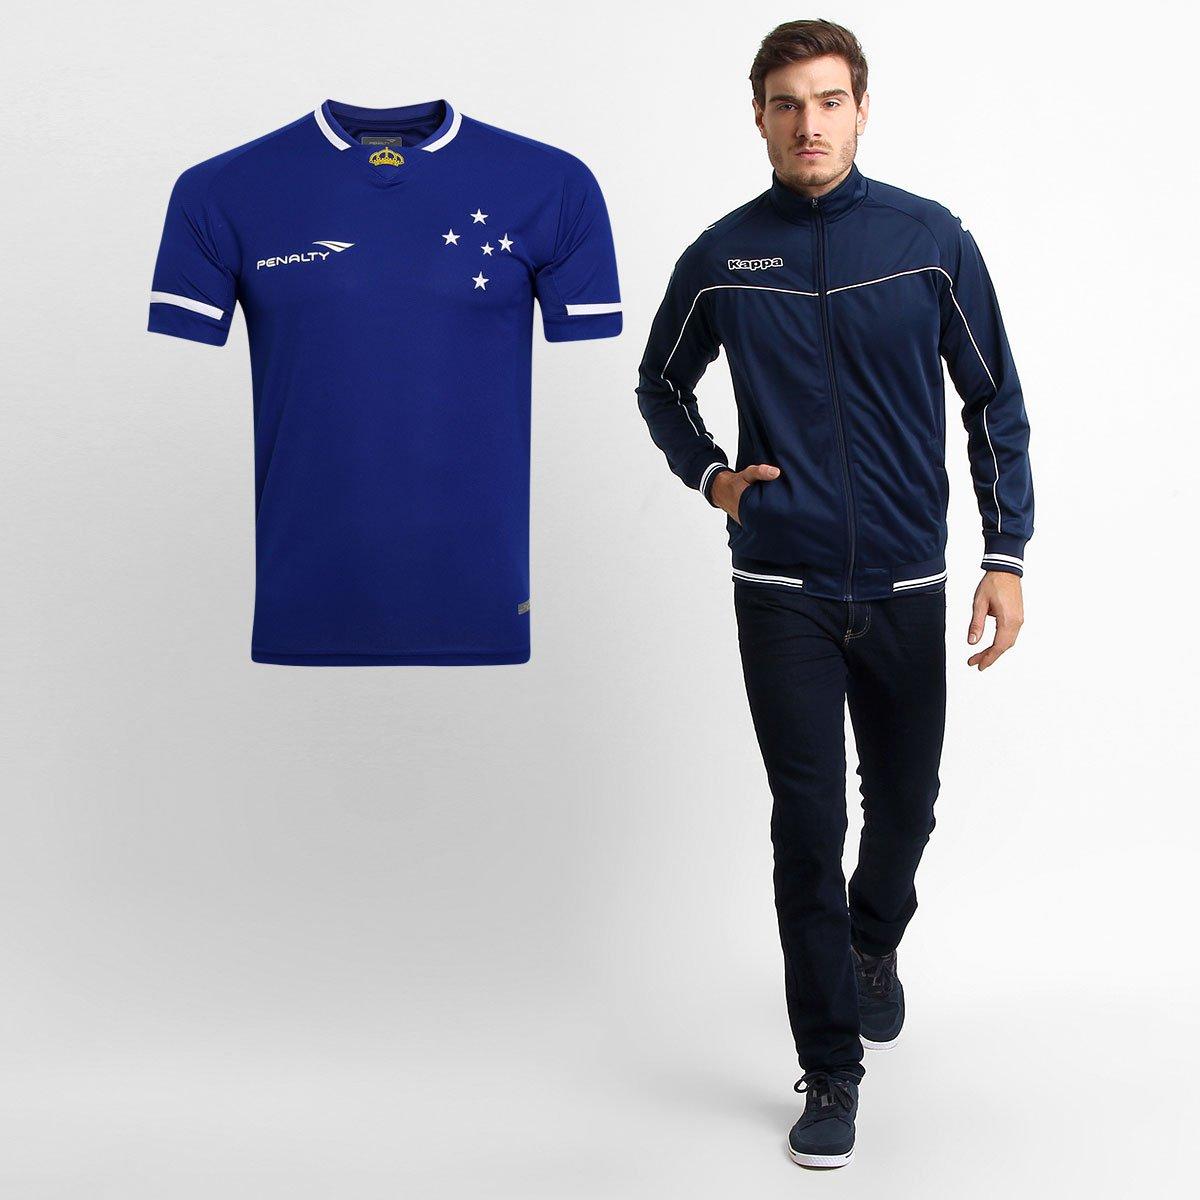 ed81fc7fd1 Kit Cruzeiro - Camisa Penalty Cruzeiro I 2015 + Jaqueta Kappa - Compre Agora